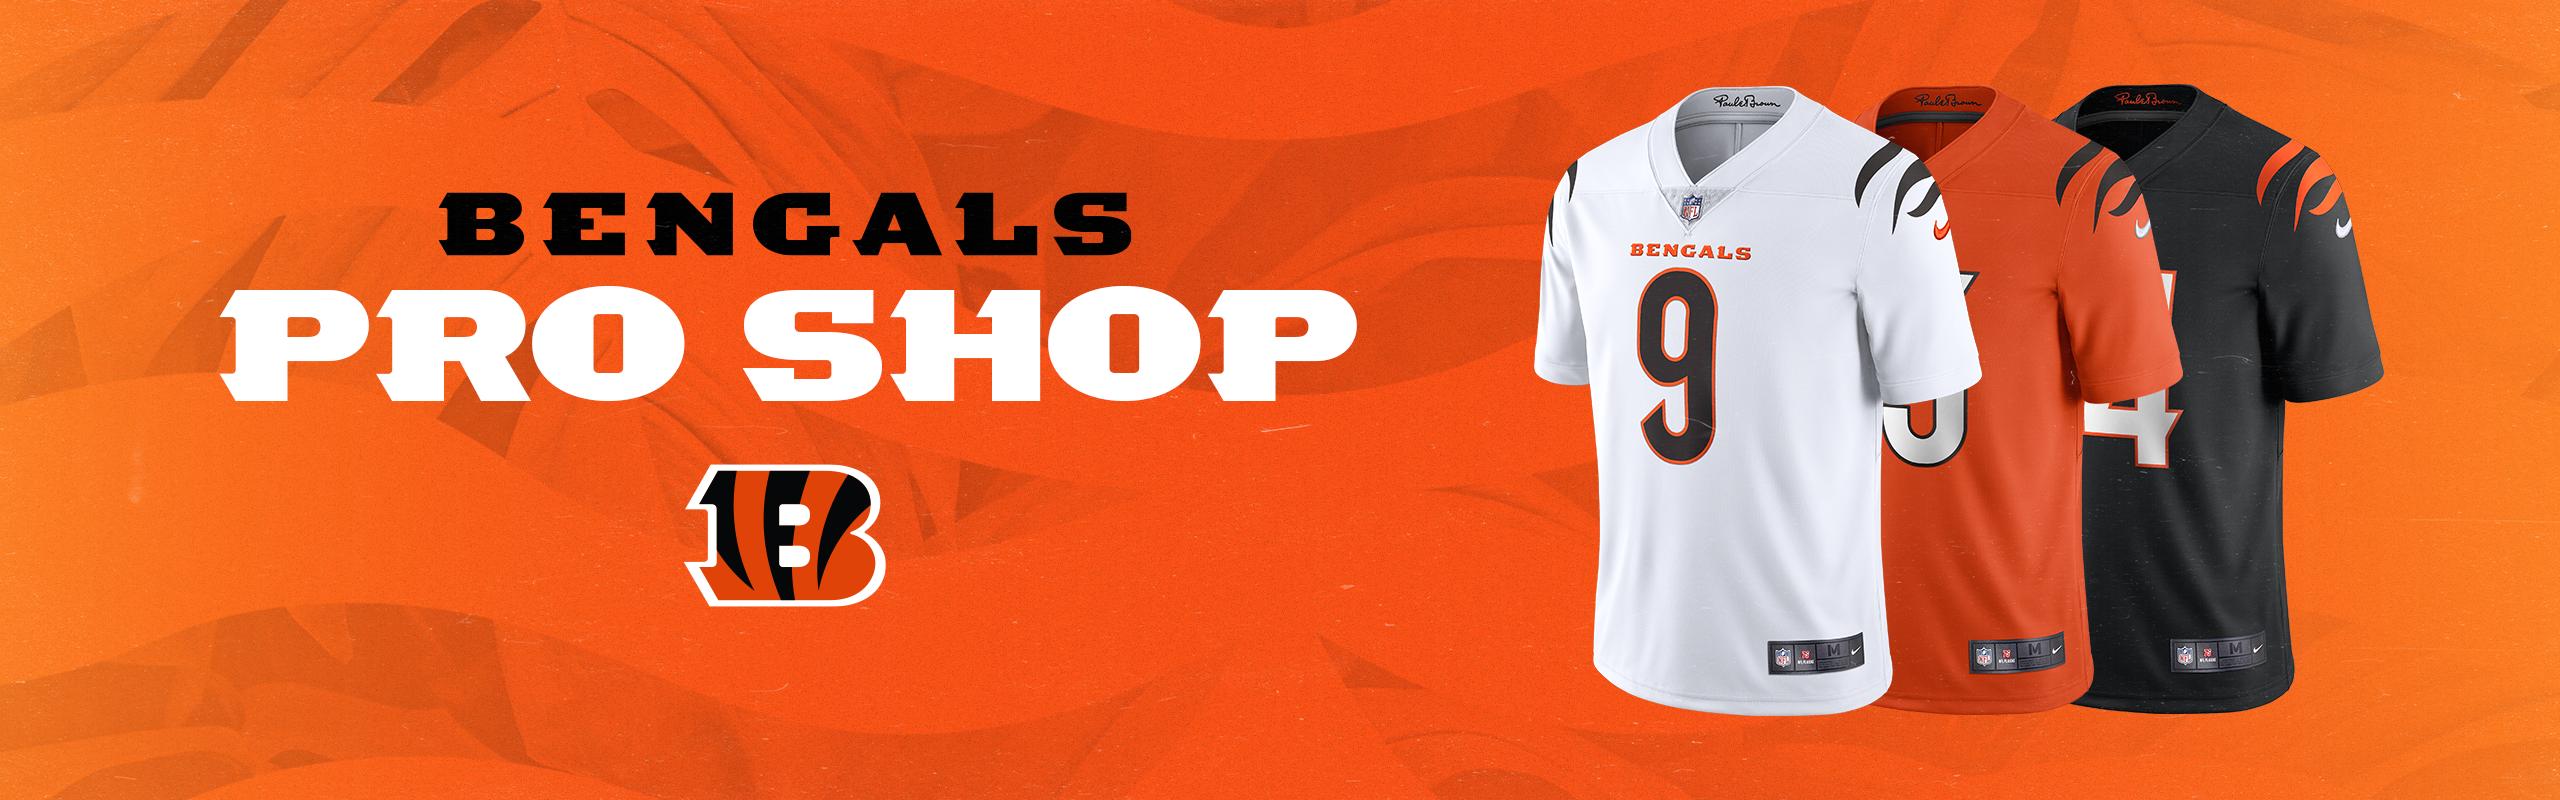 Cincinnati Bengals Pro Shop | Paul Brown Stadium - Bengals.com